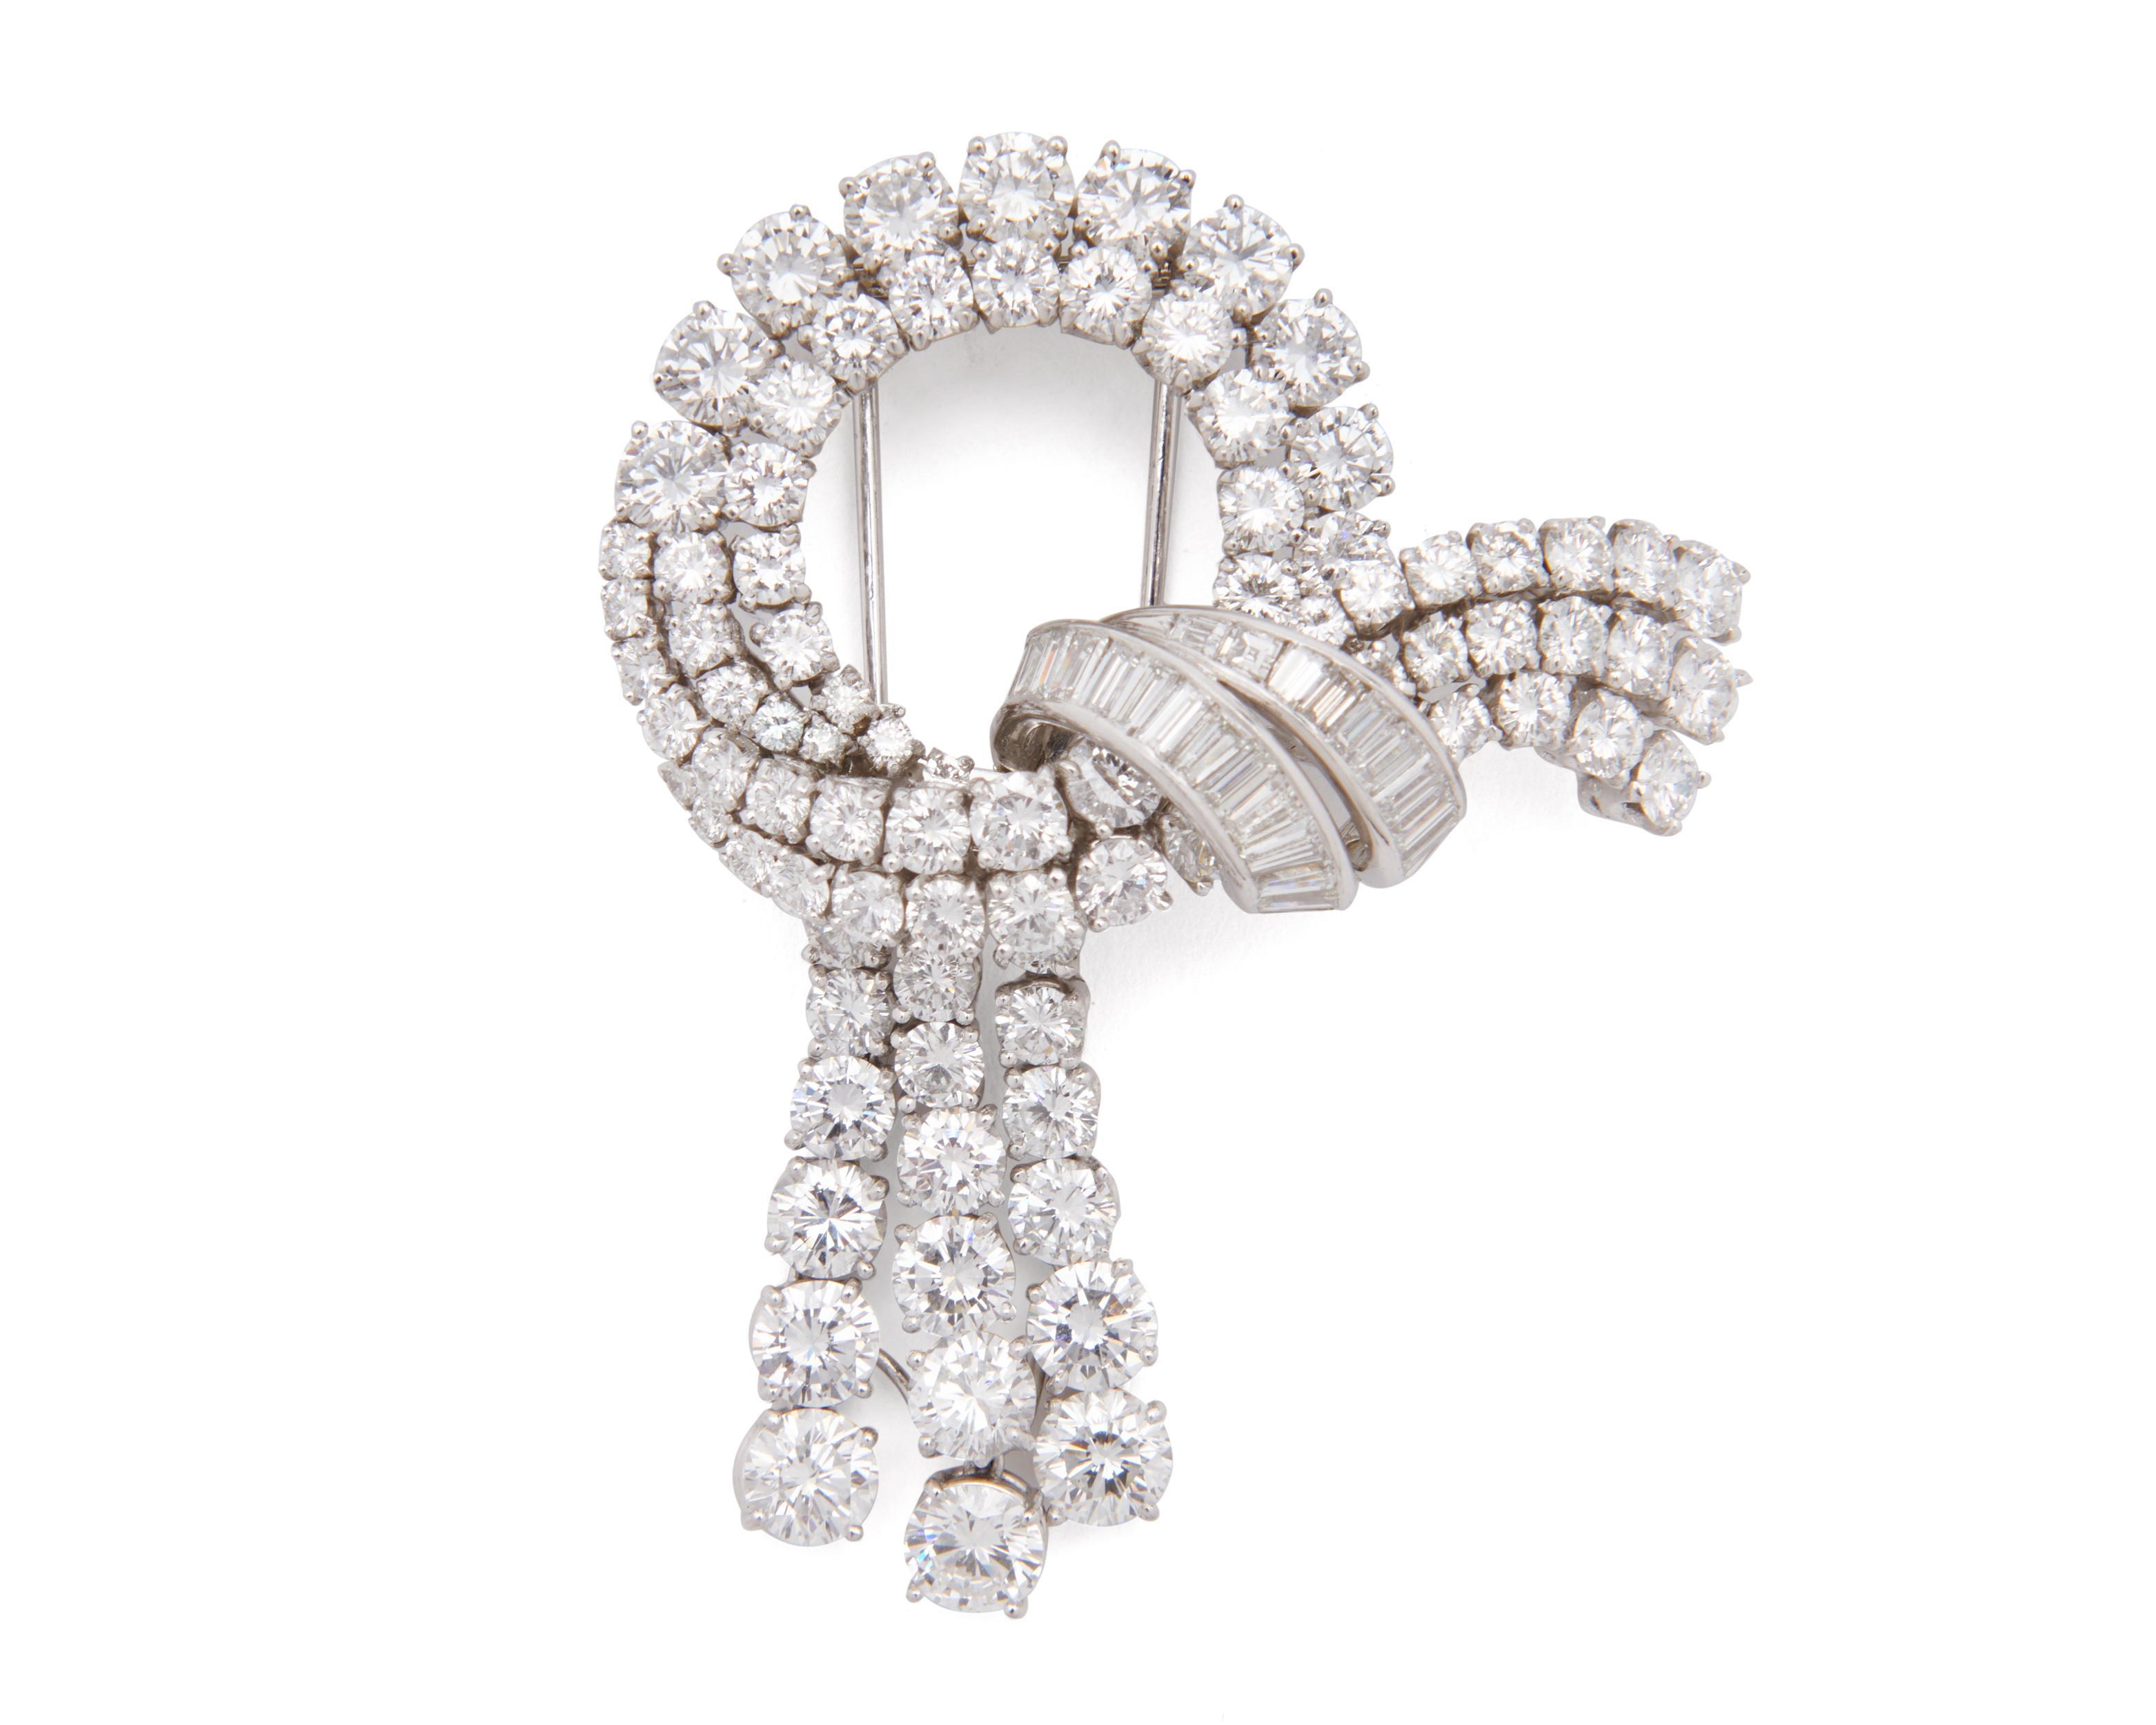 VAN CLEEF & ARPELS Platinum and Diamond Brooch